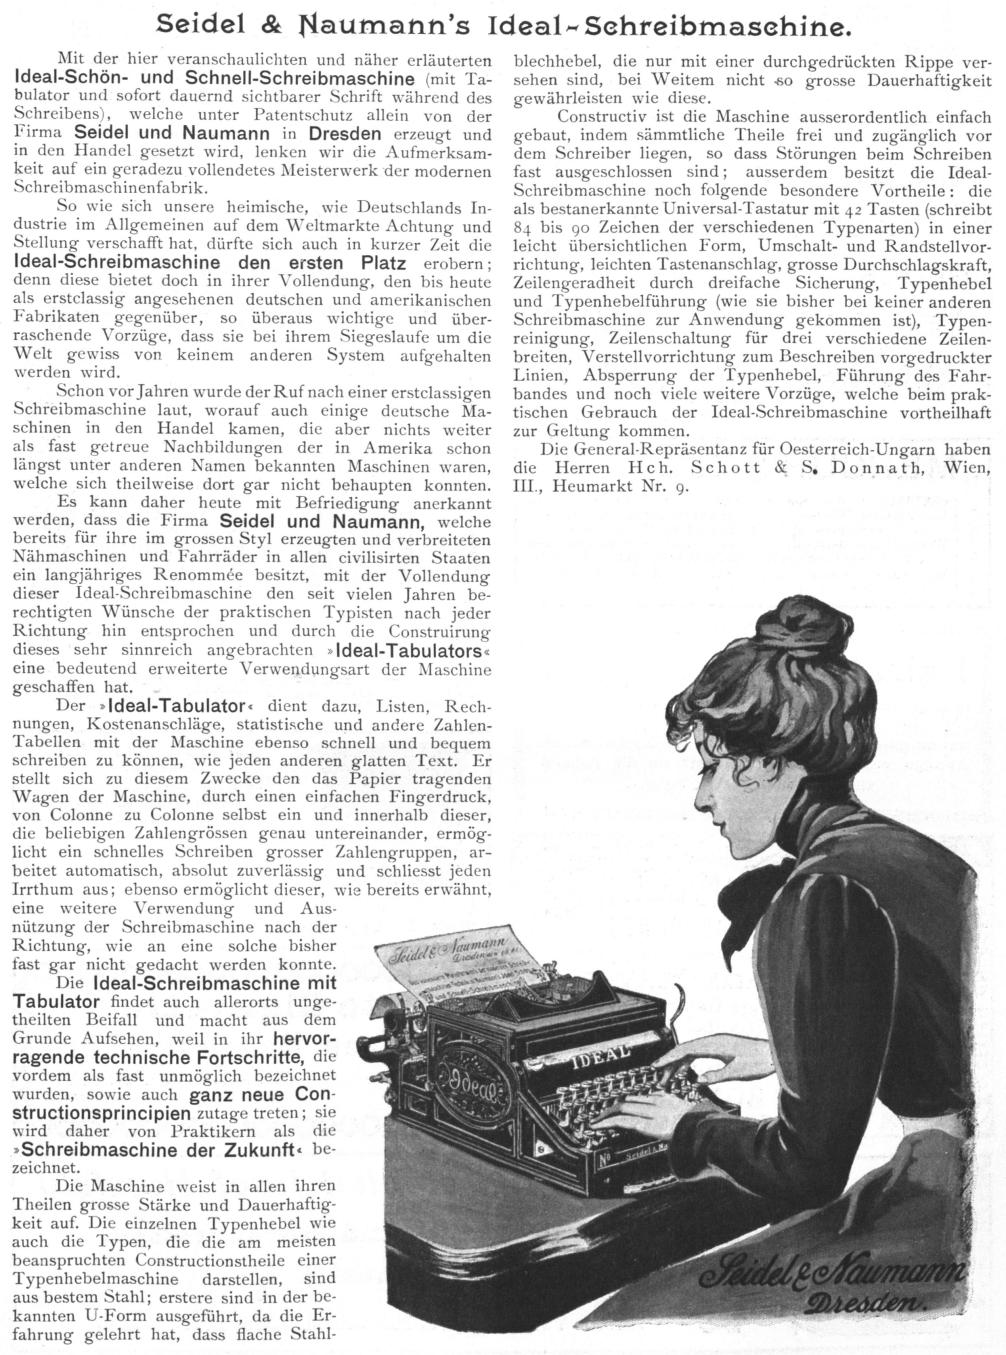 『Sport & Salon』1902年5月3日号